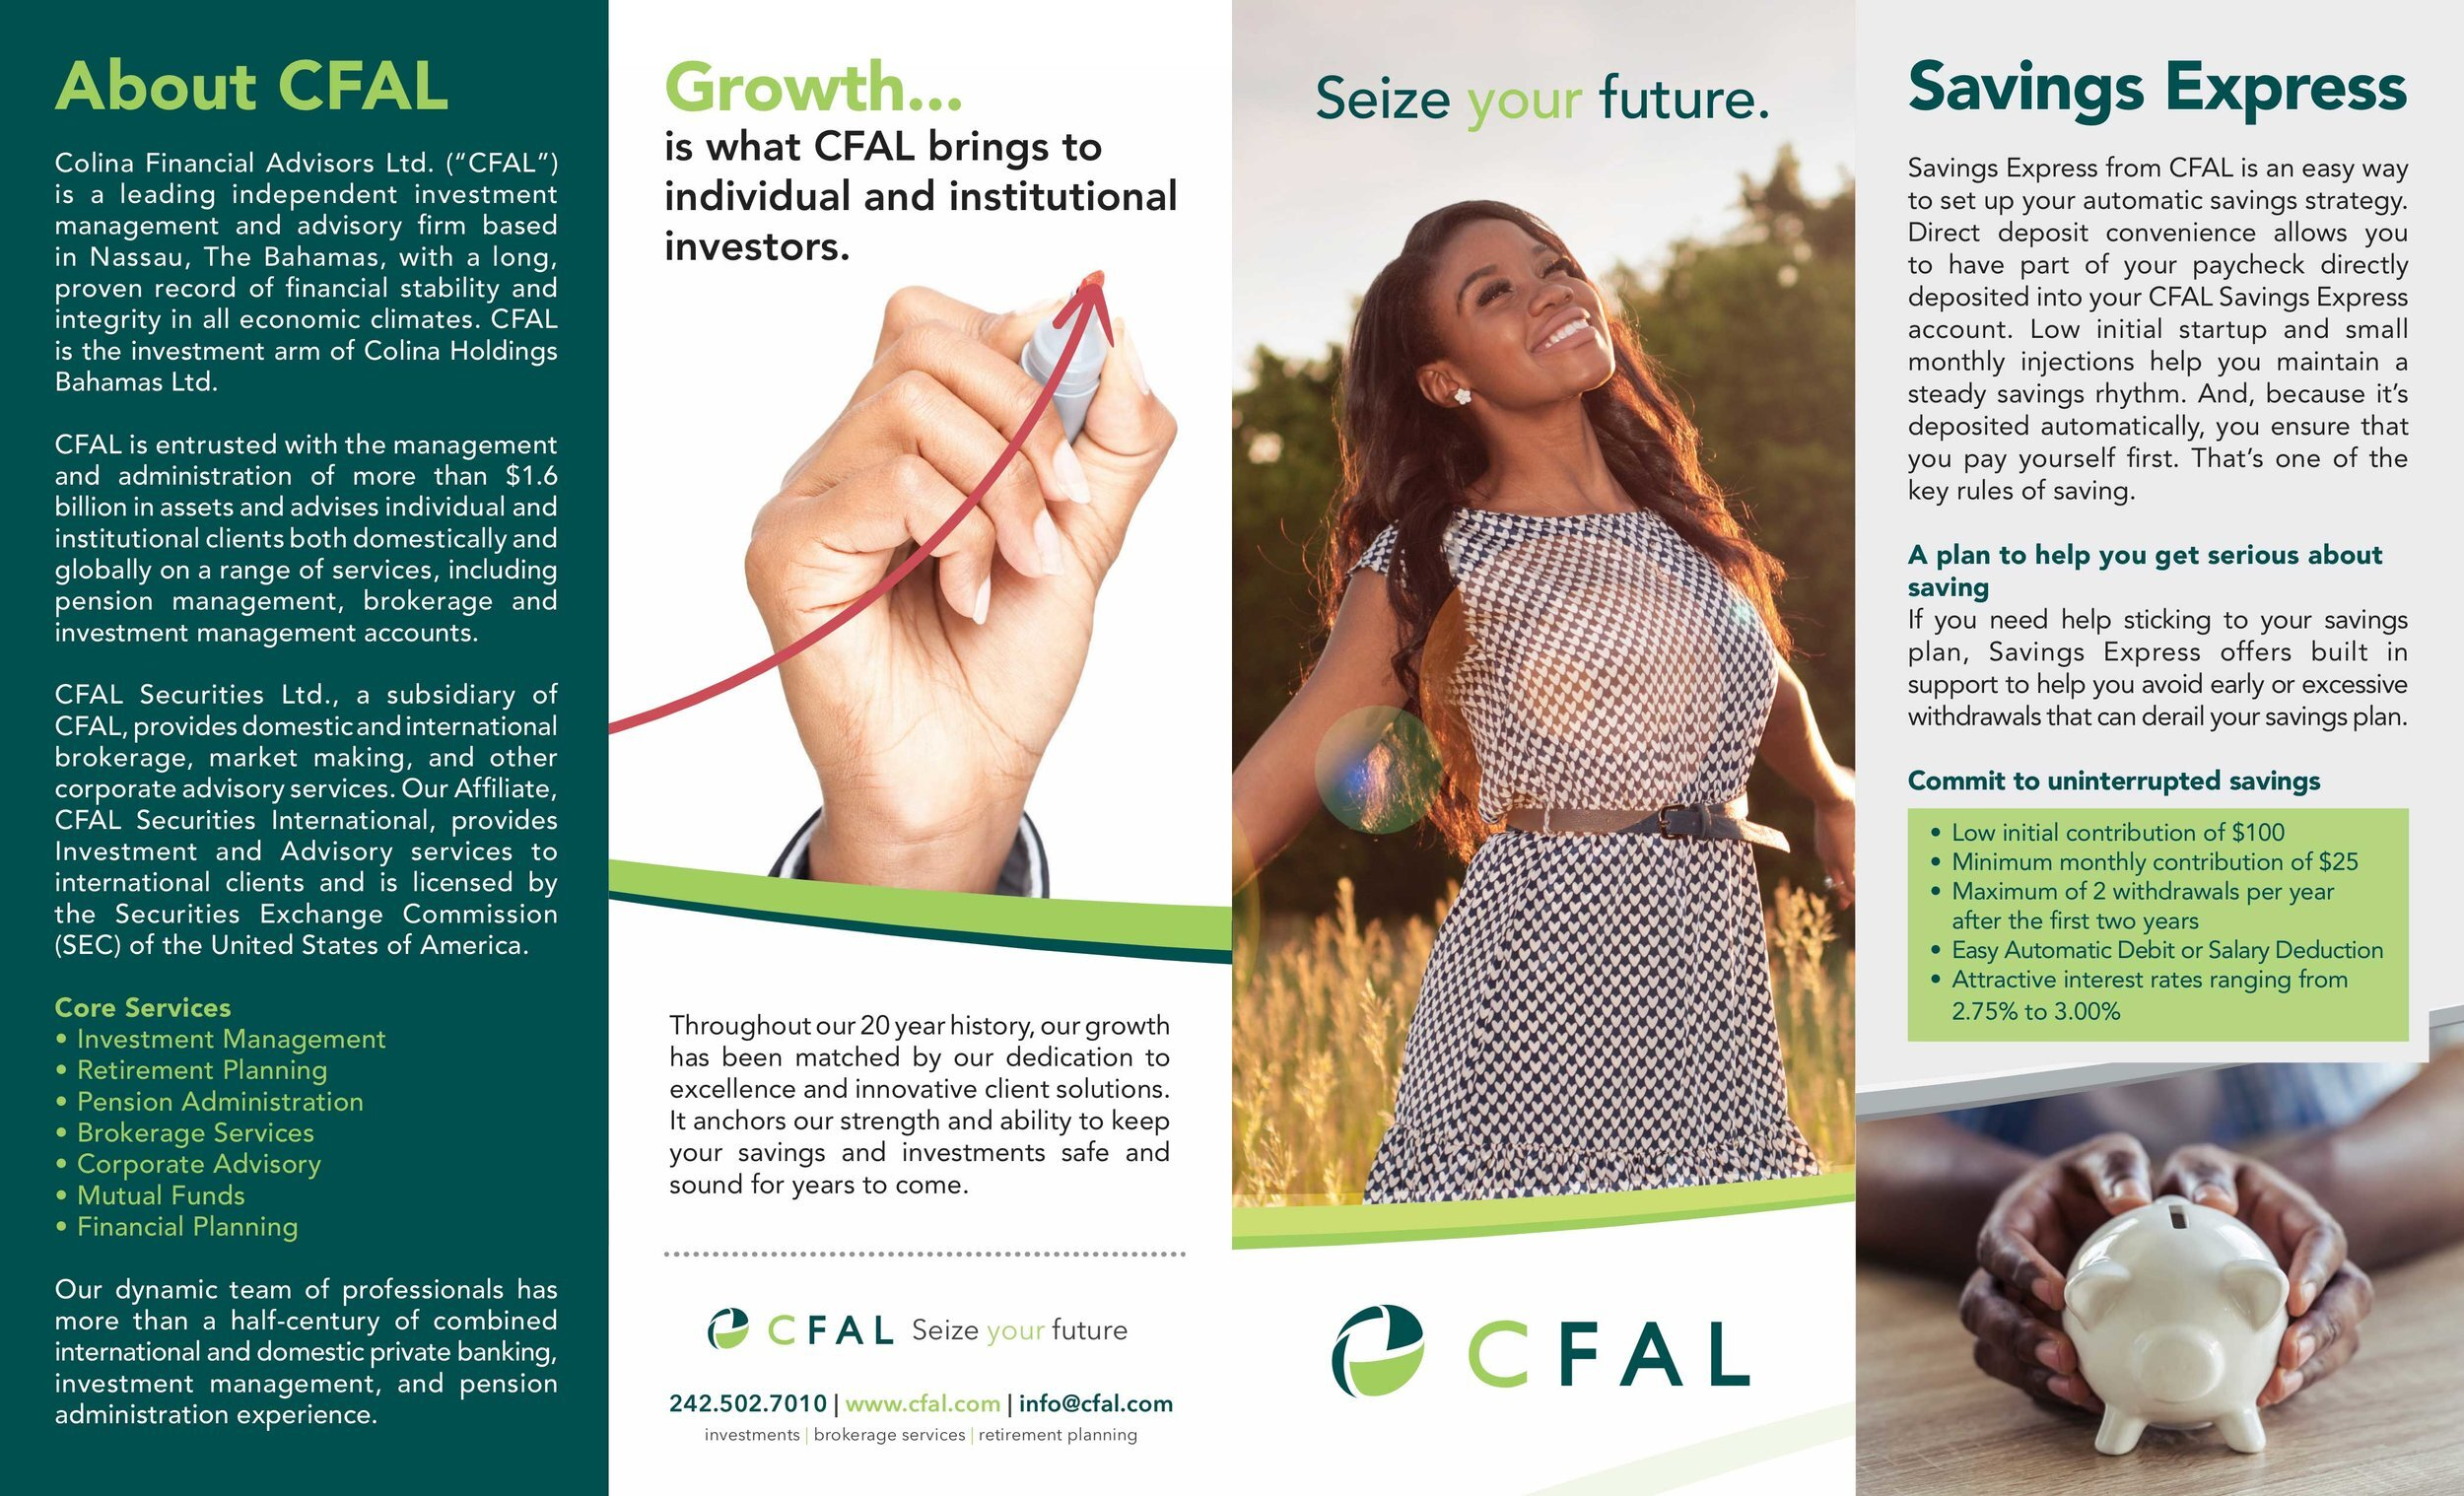 CFAL-brochure_feb2018-final.jpg